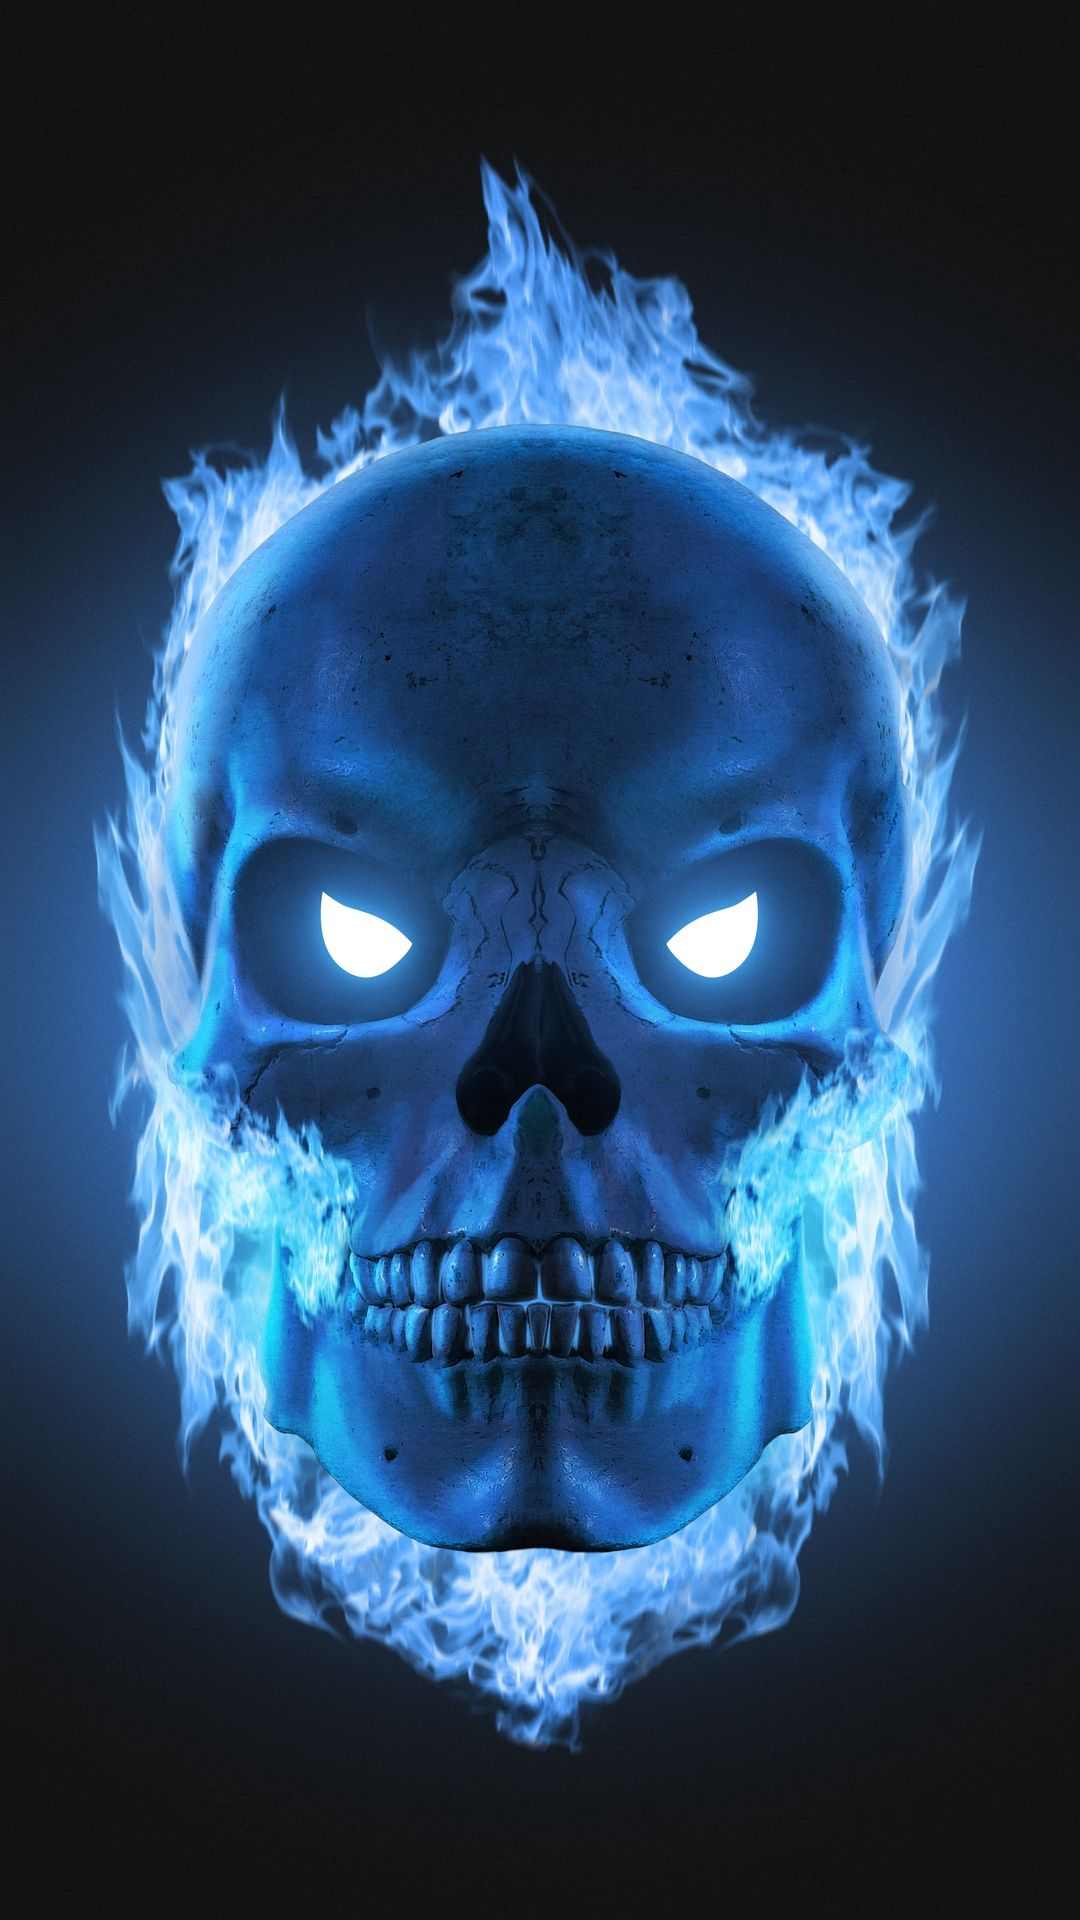 More At Mike Vands Skull Wallpaper Skull Artwork Skull Pictures